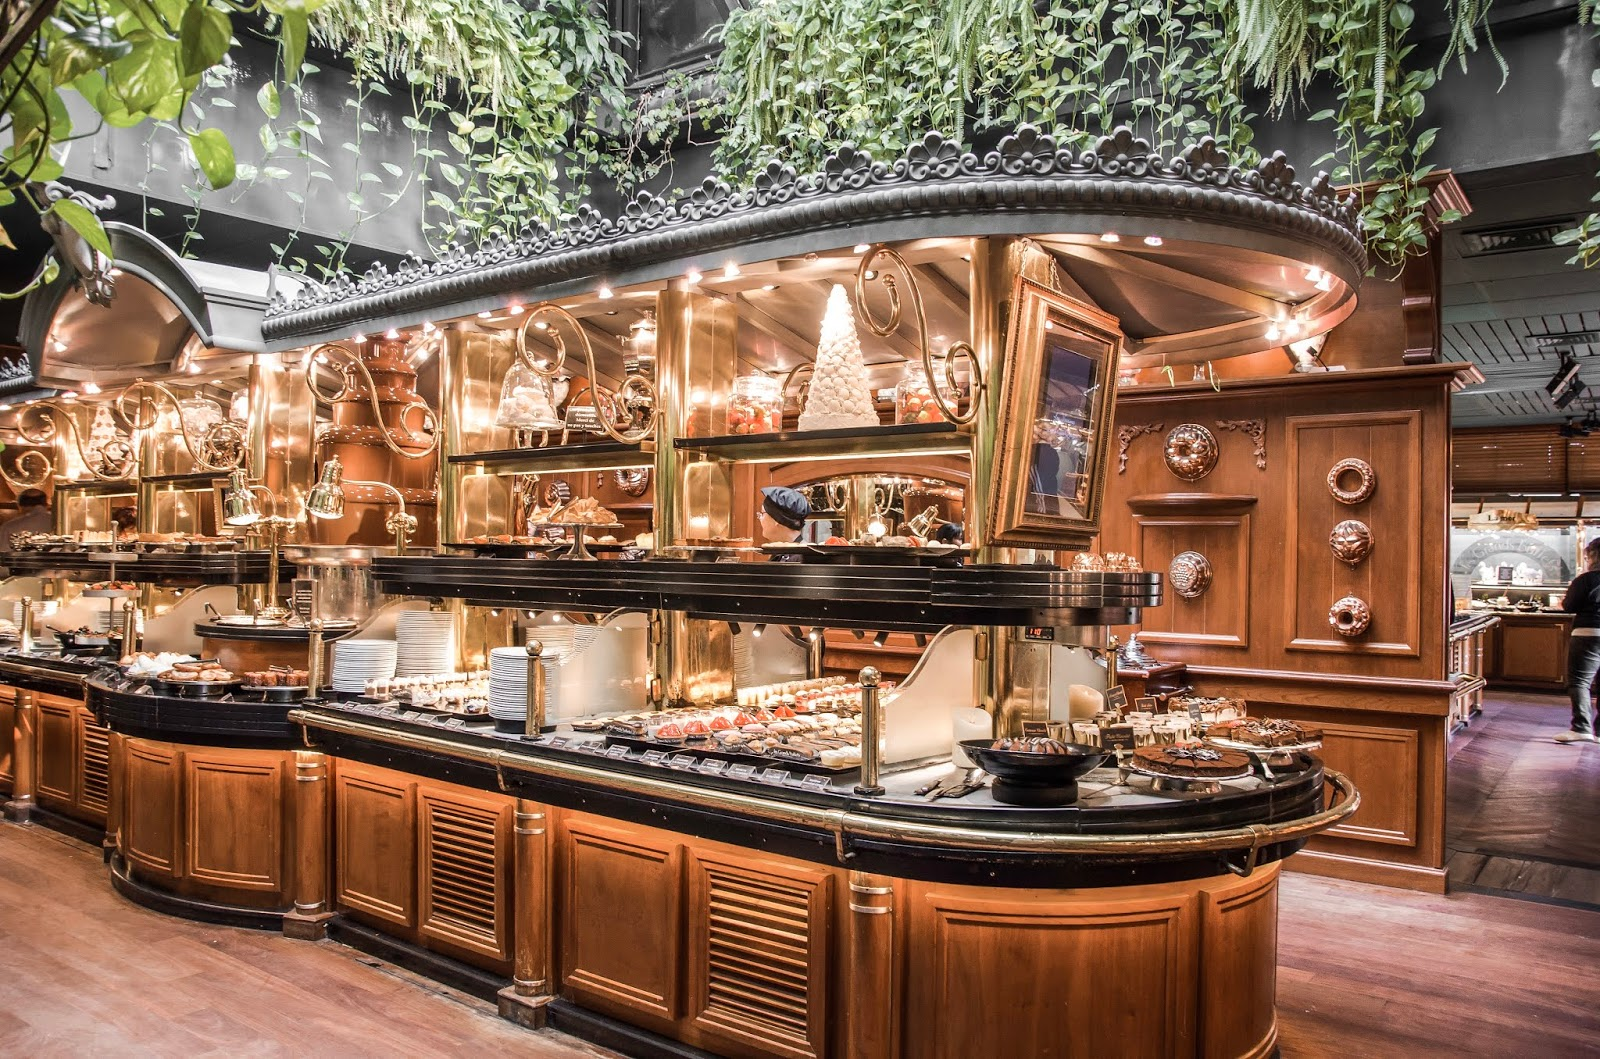 Les Grands Buffets con Renfe-SNCF